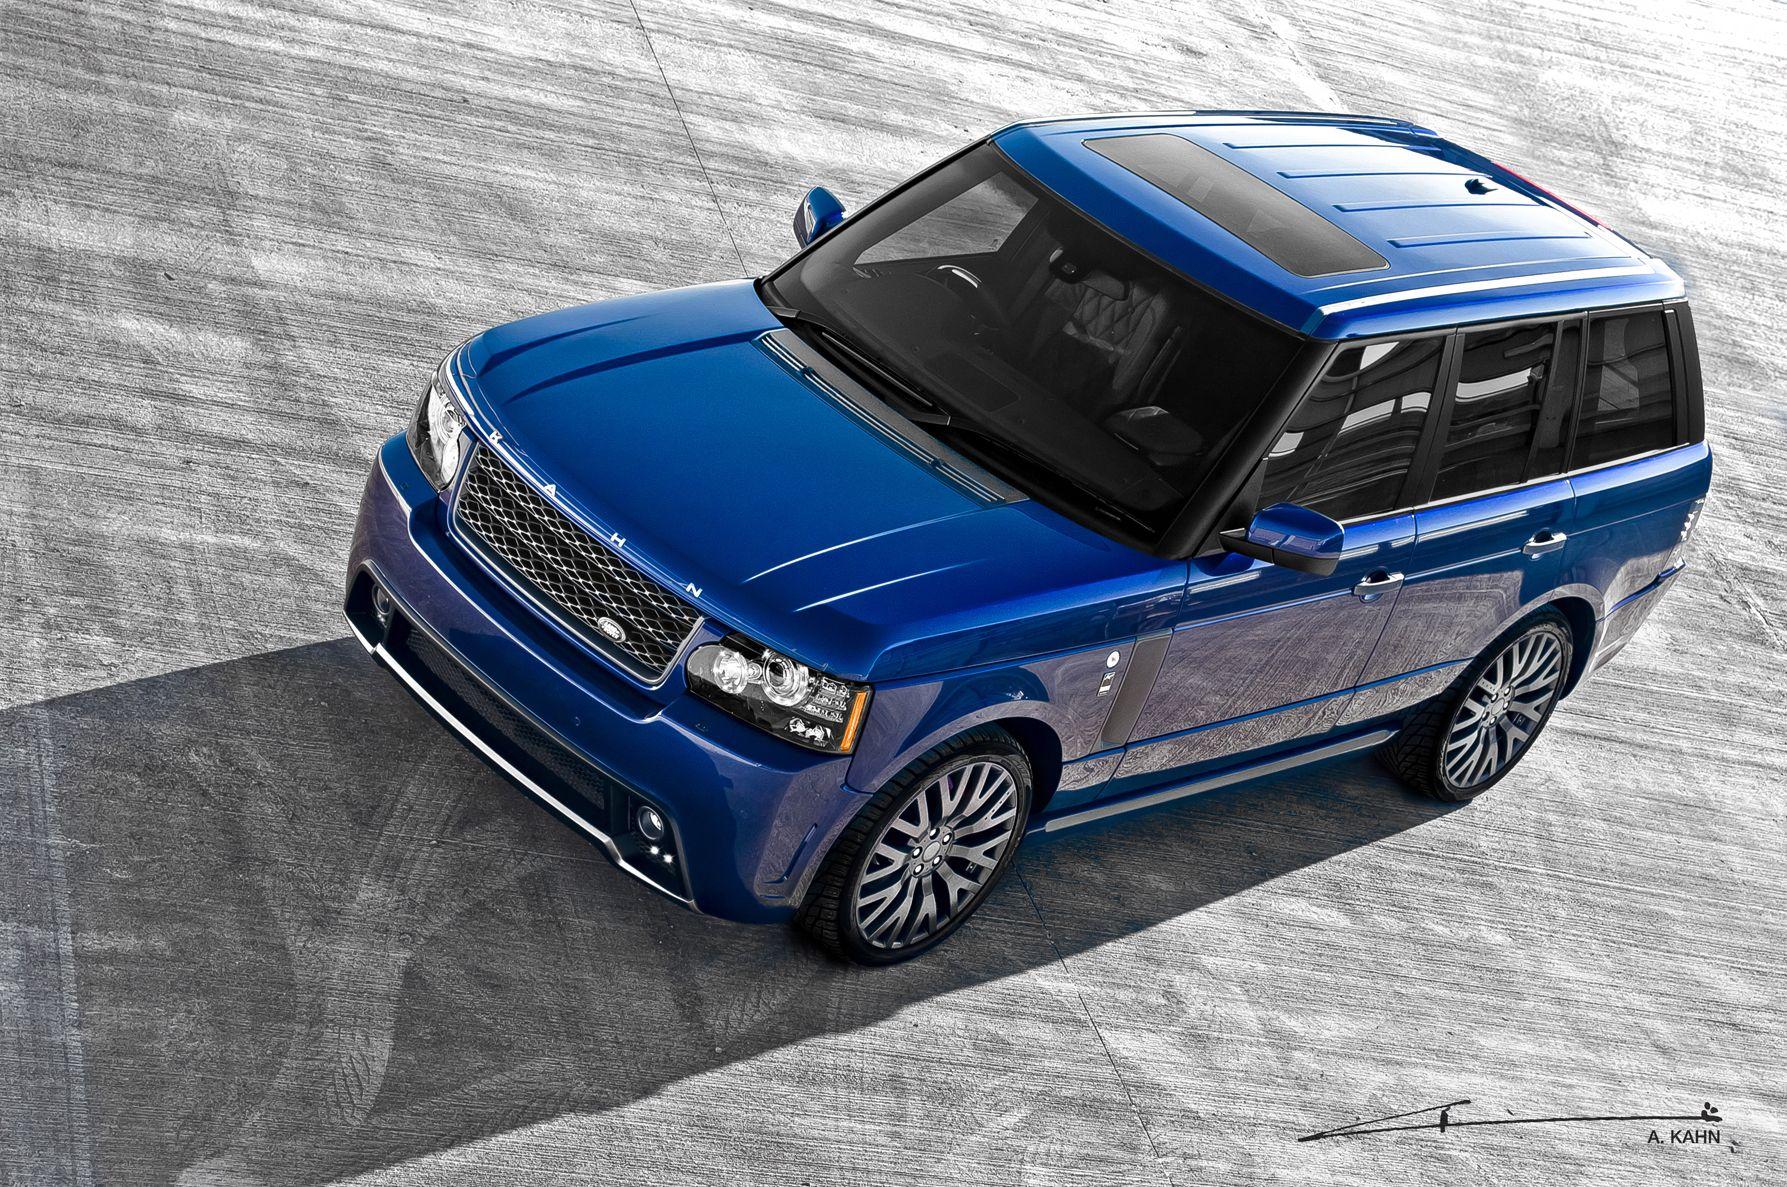 Regal yet nonchalant the Kahn Bali Blue Range Rover